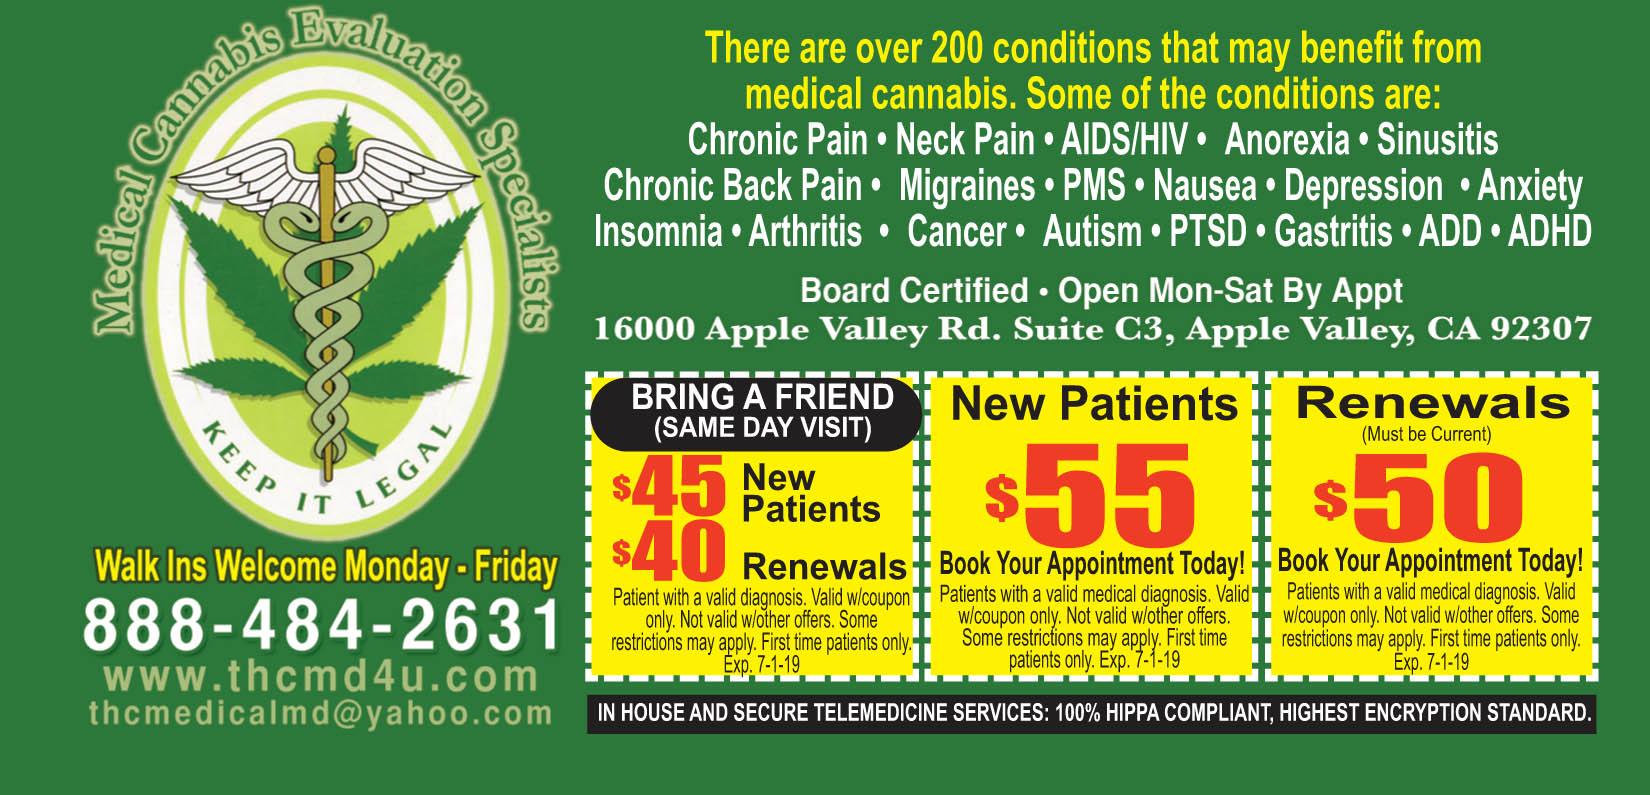 Medical Cannabis Evaluation Specialist.jpg